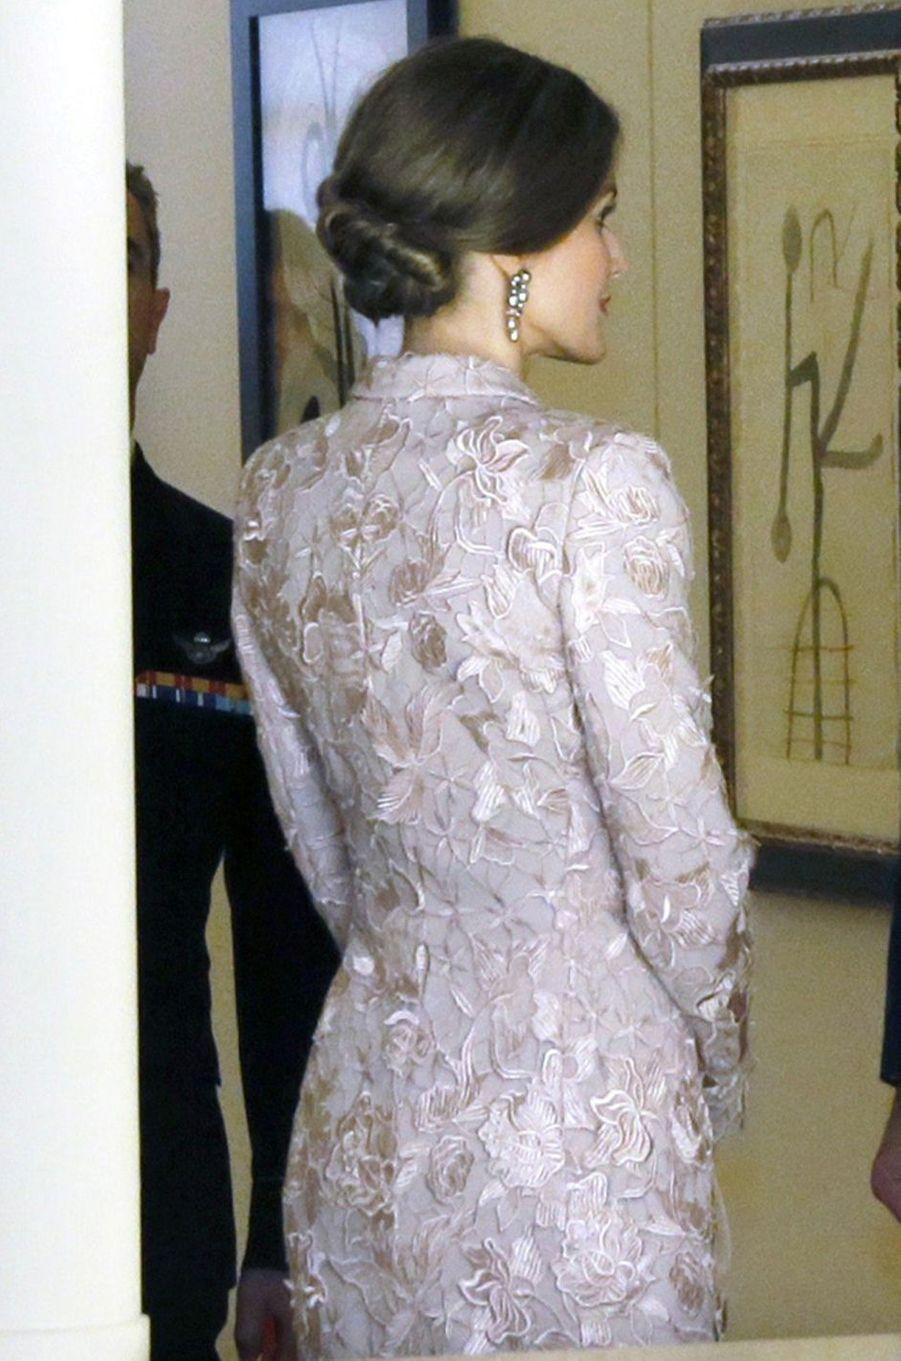 La reine Letizia d'Espagne à Porto, le 28 novembre 2016